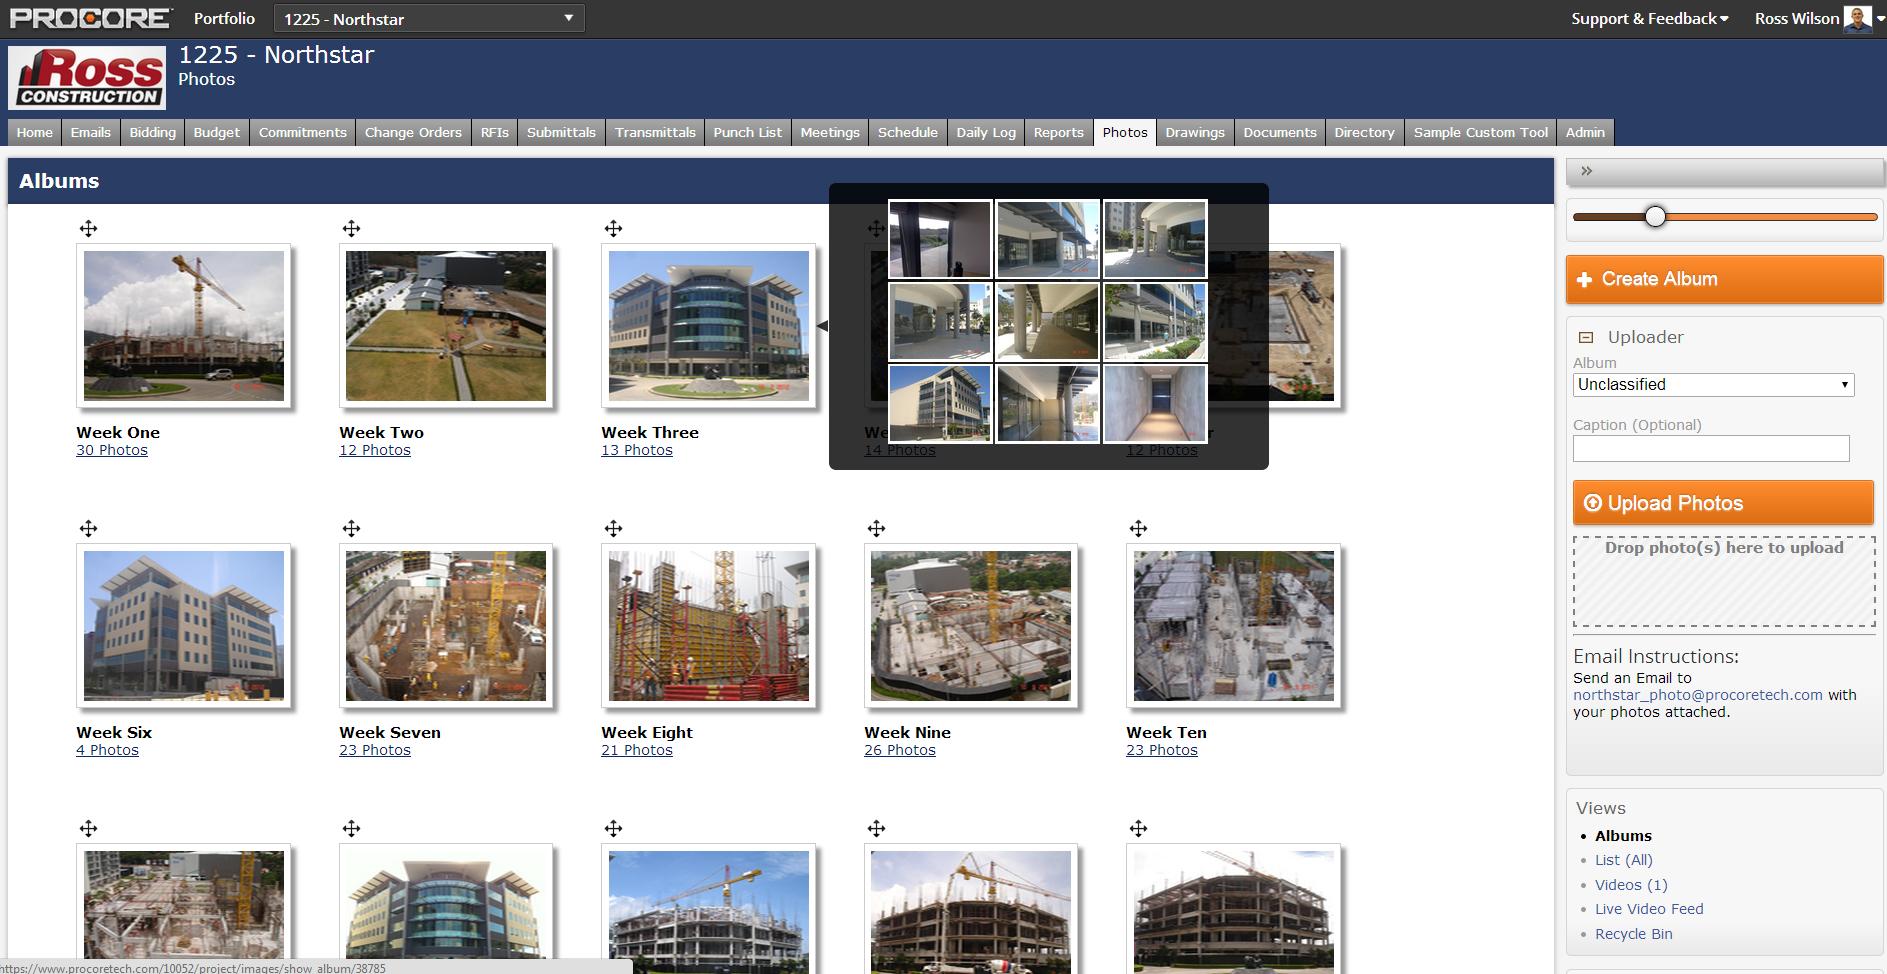 Procore screenshot # 4 | Procore | Construction project management